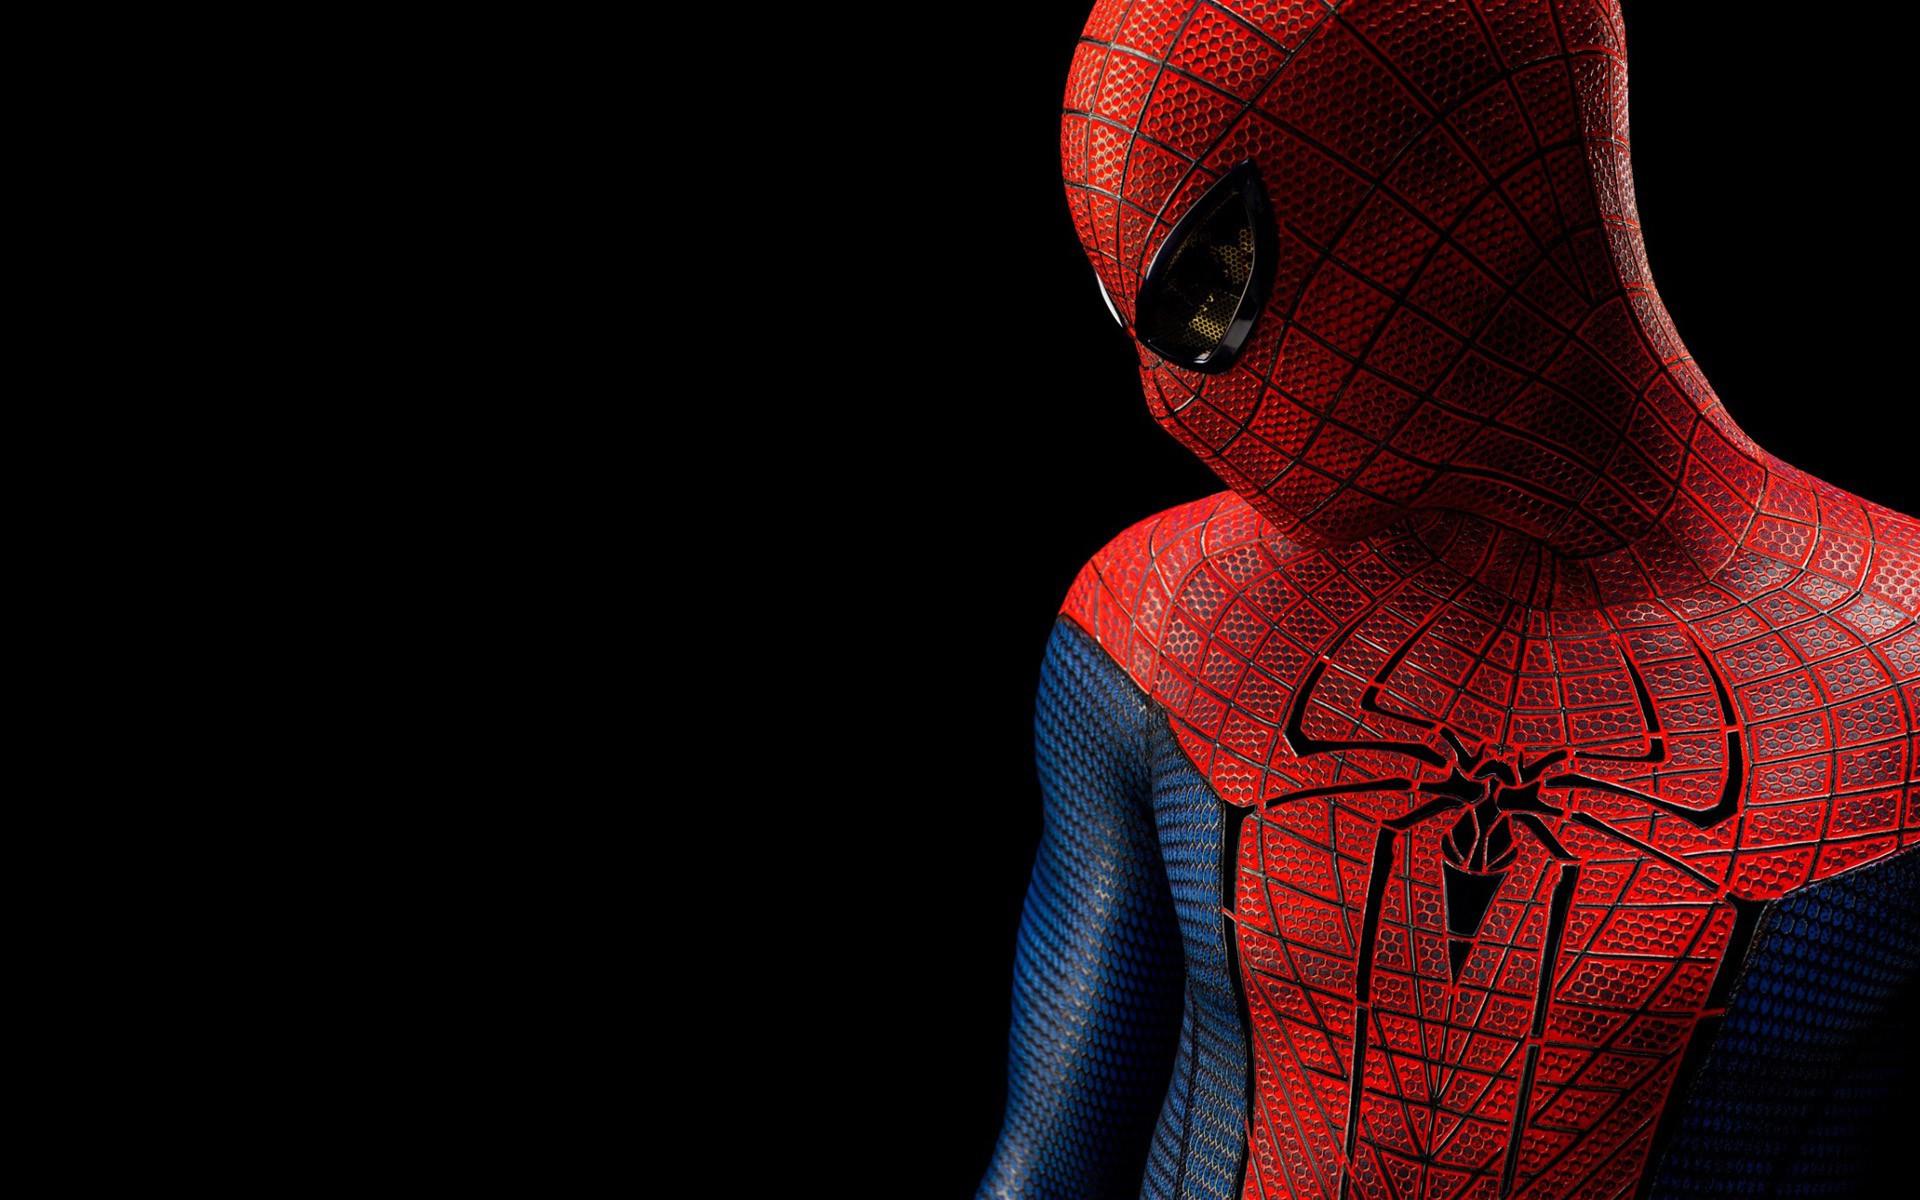 Traje de Spiderman - 1920x1200